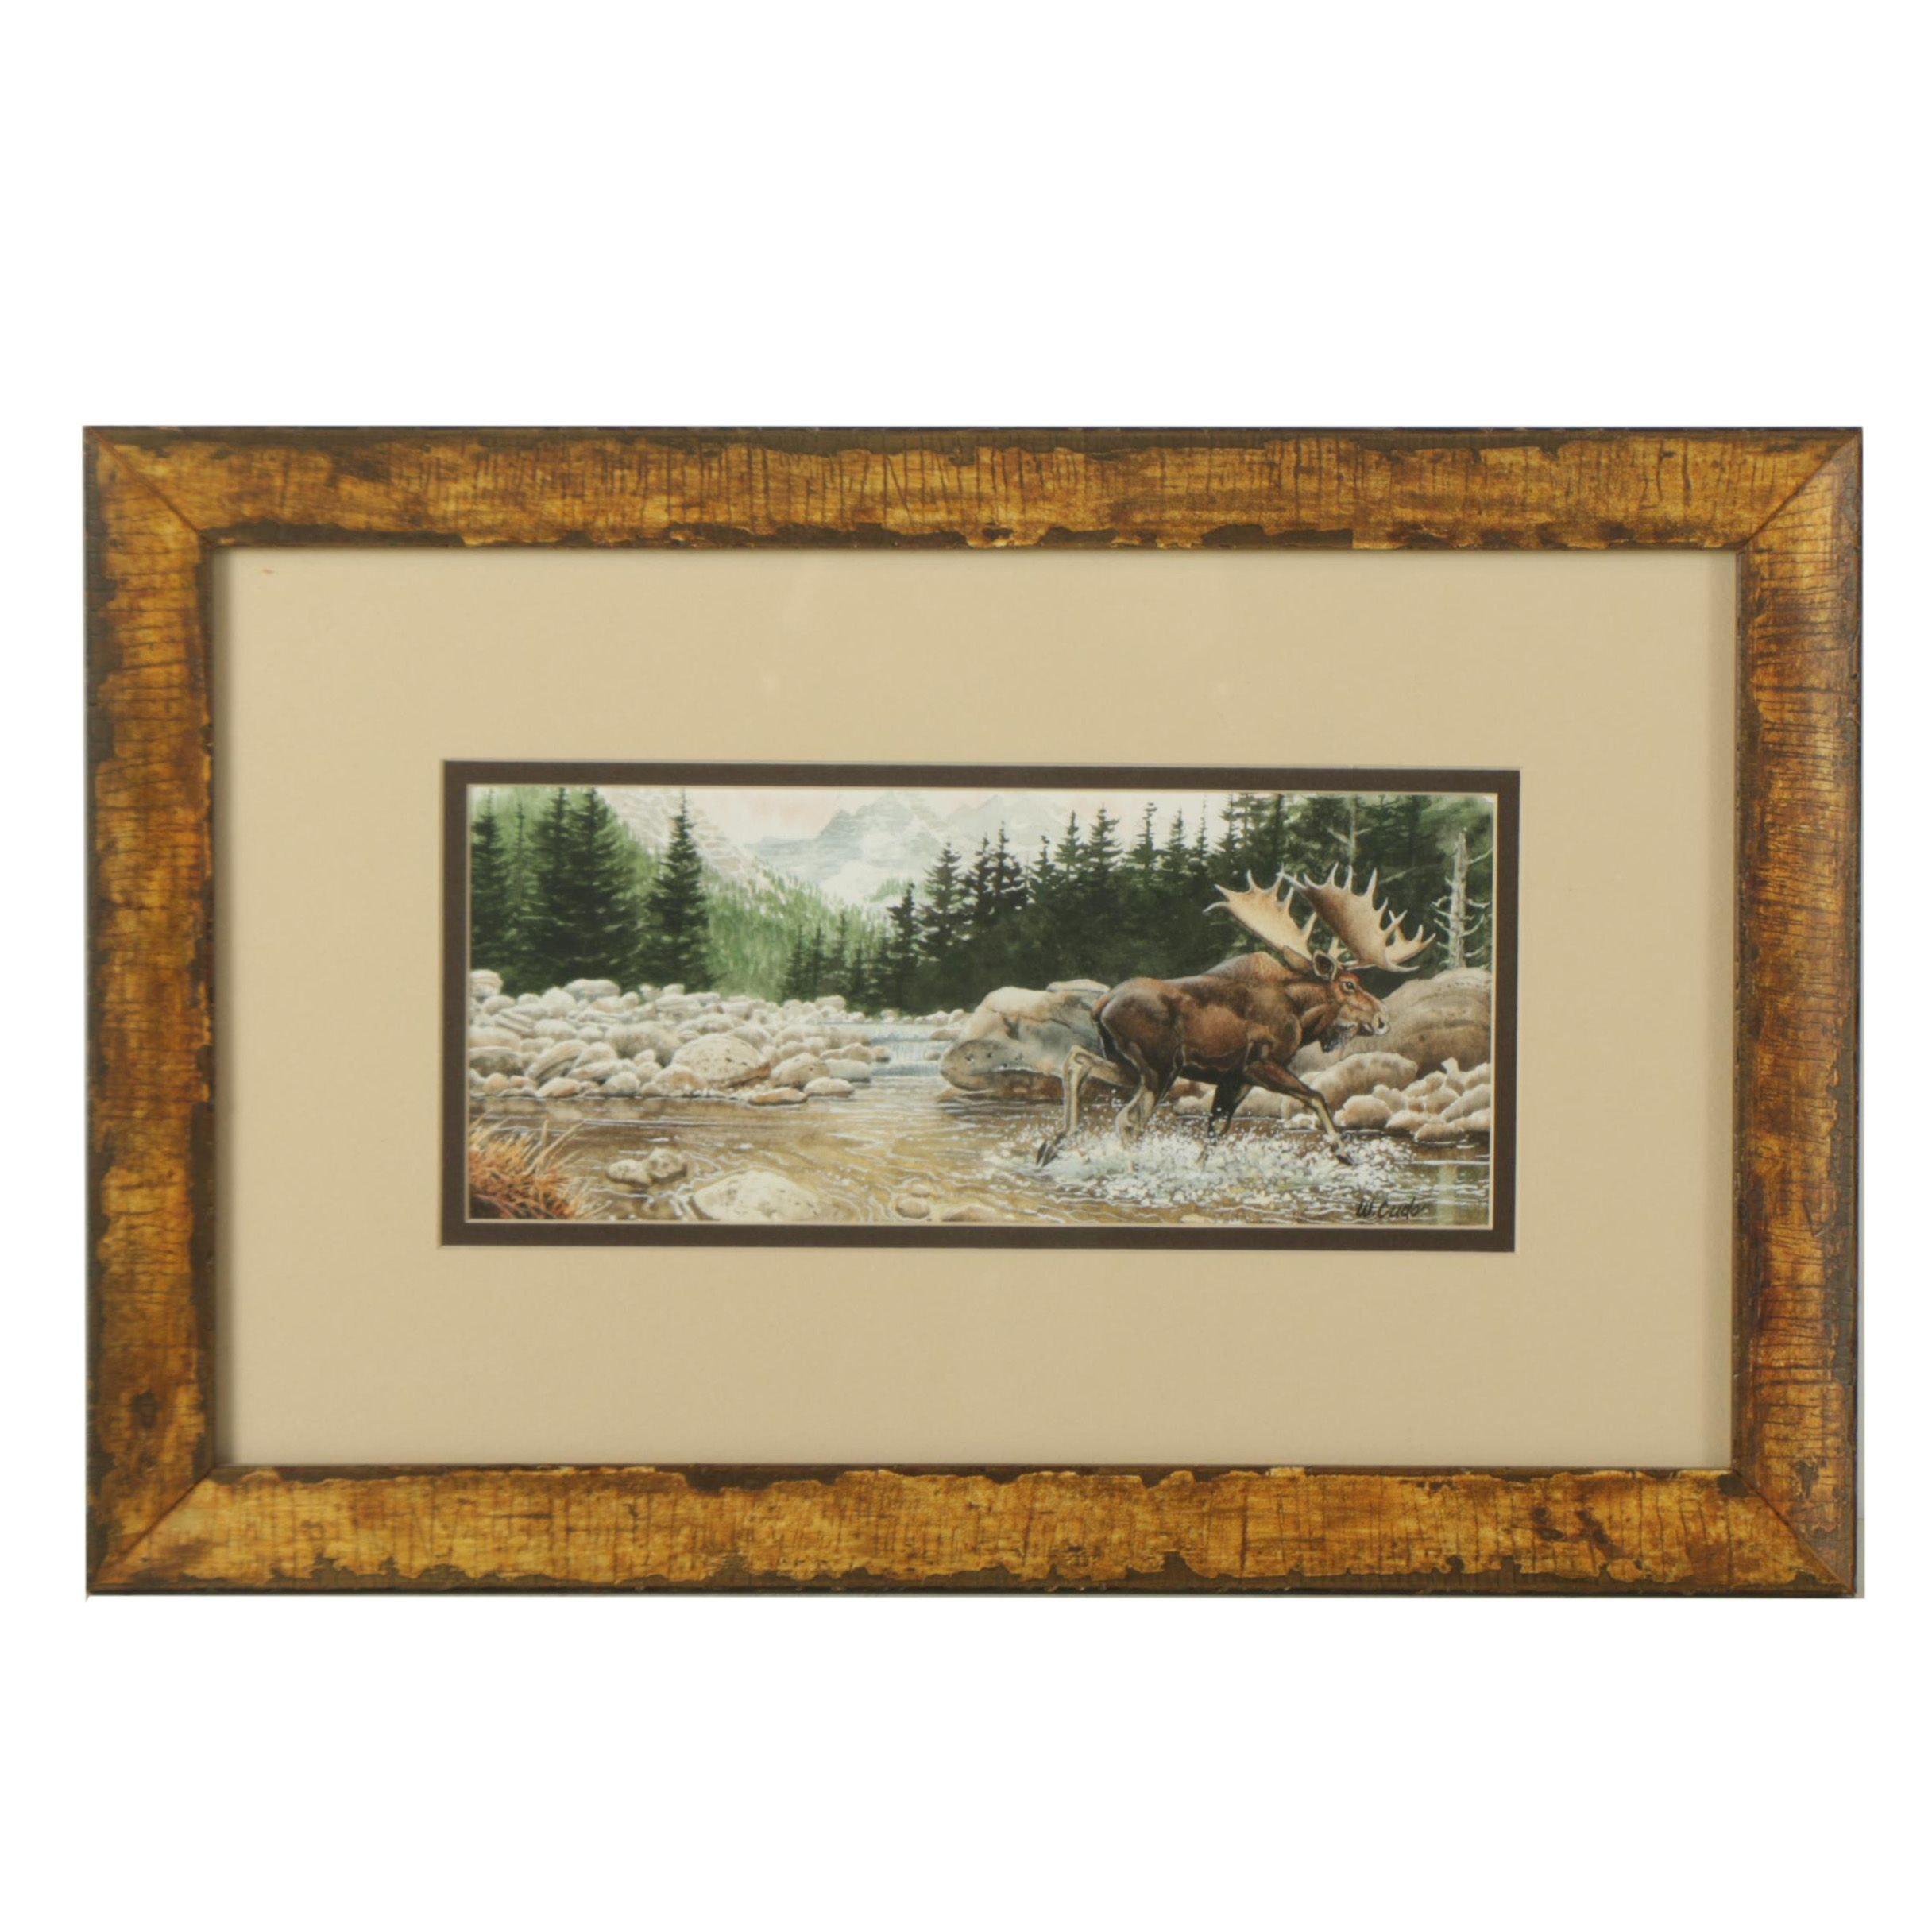 Walt Cude Watercolor on Paper of Moose in the Wild